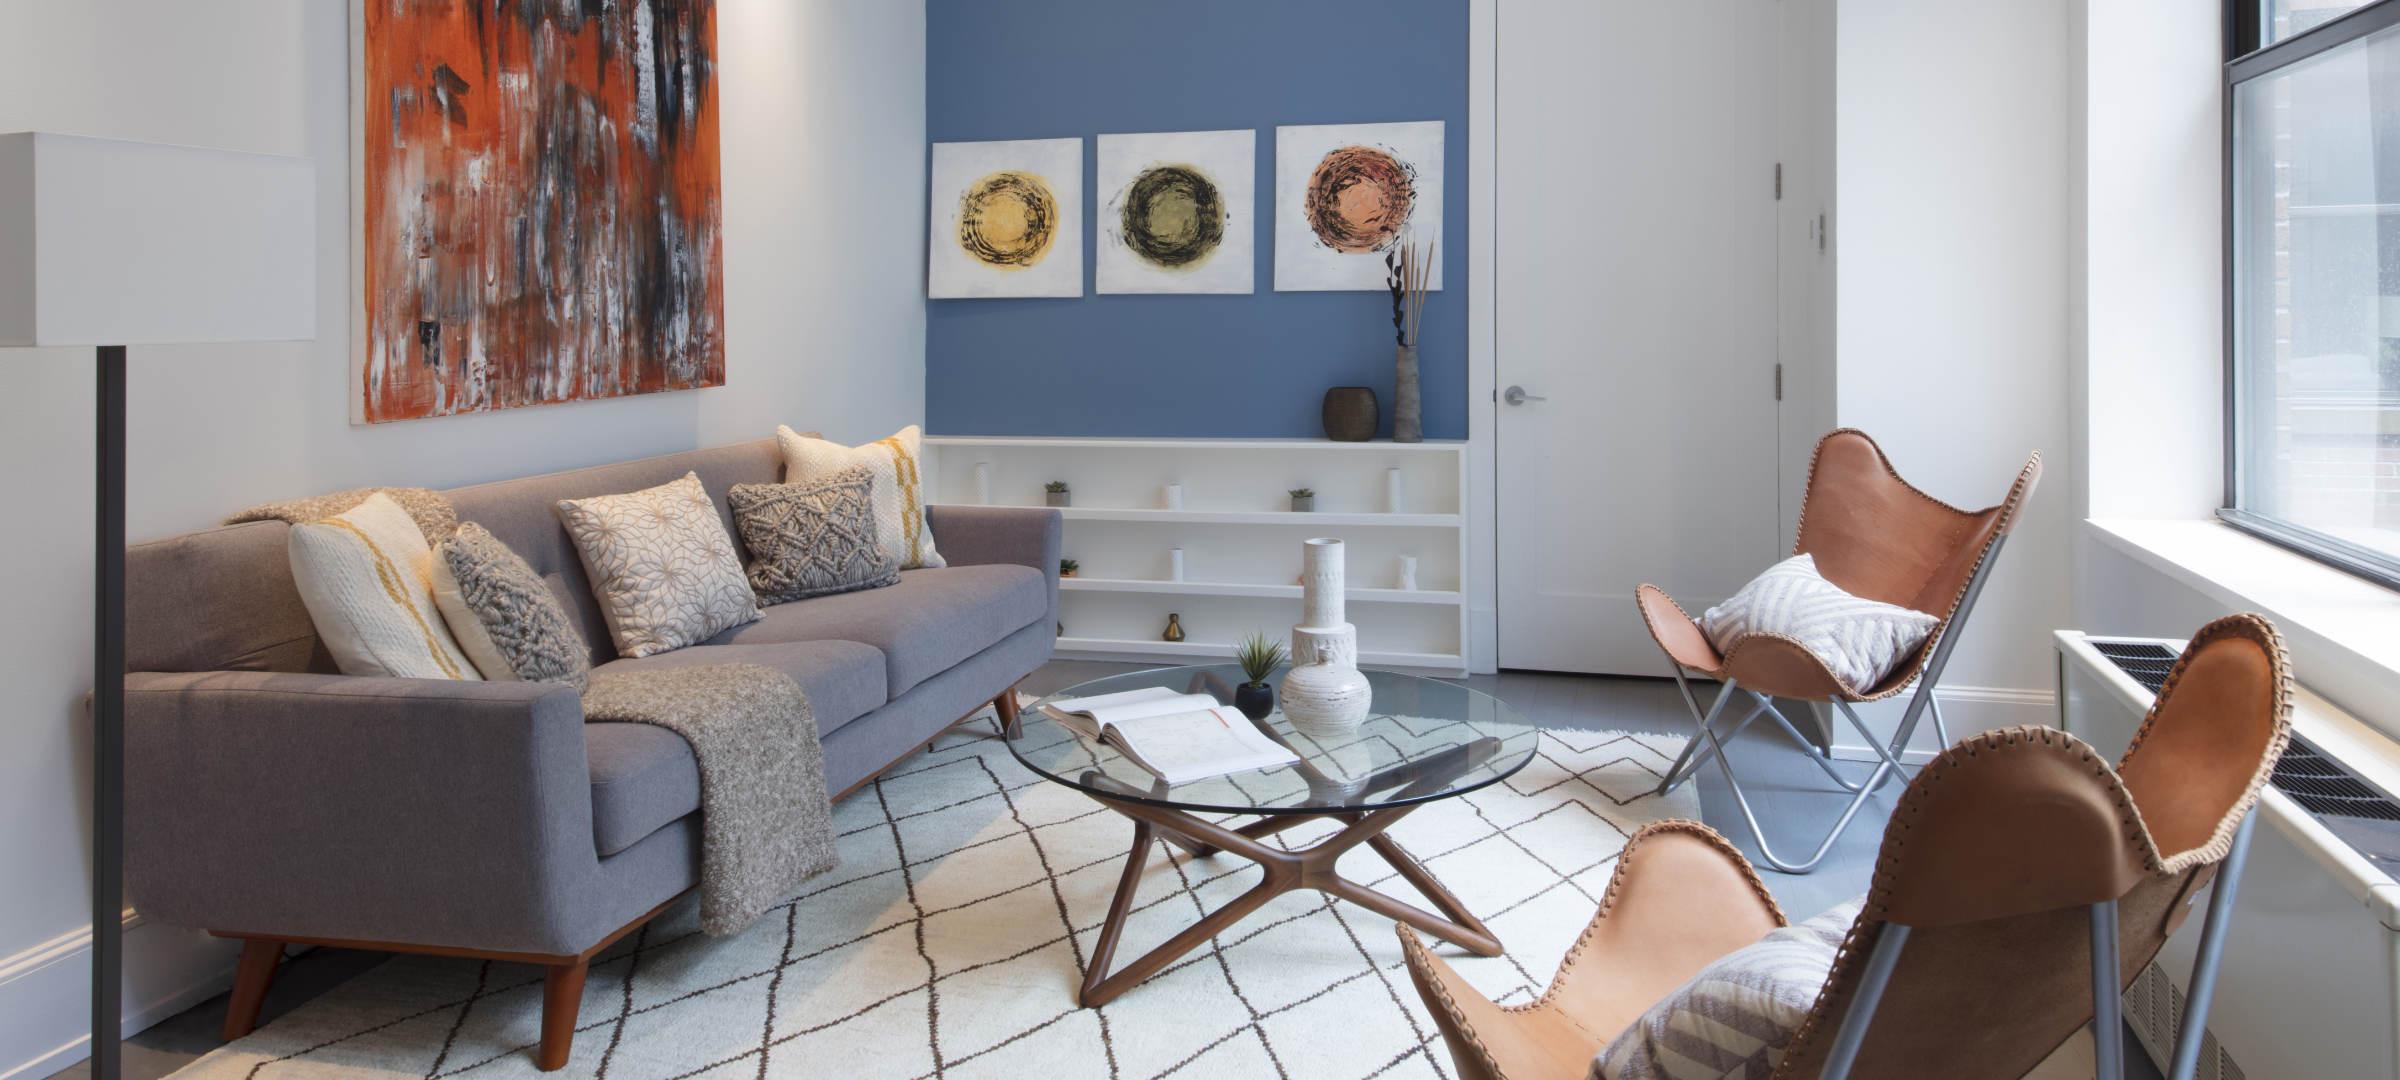 SBSG Interior Design Den 260 Park Avenue South, NY